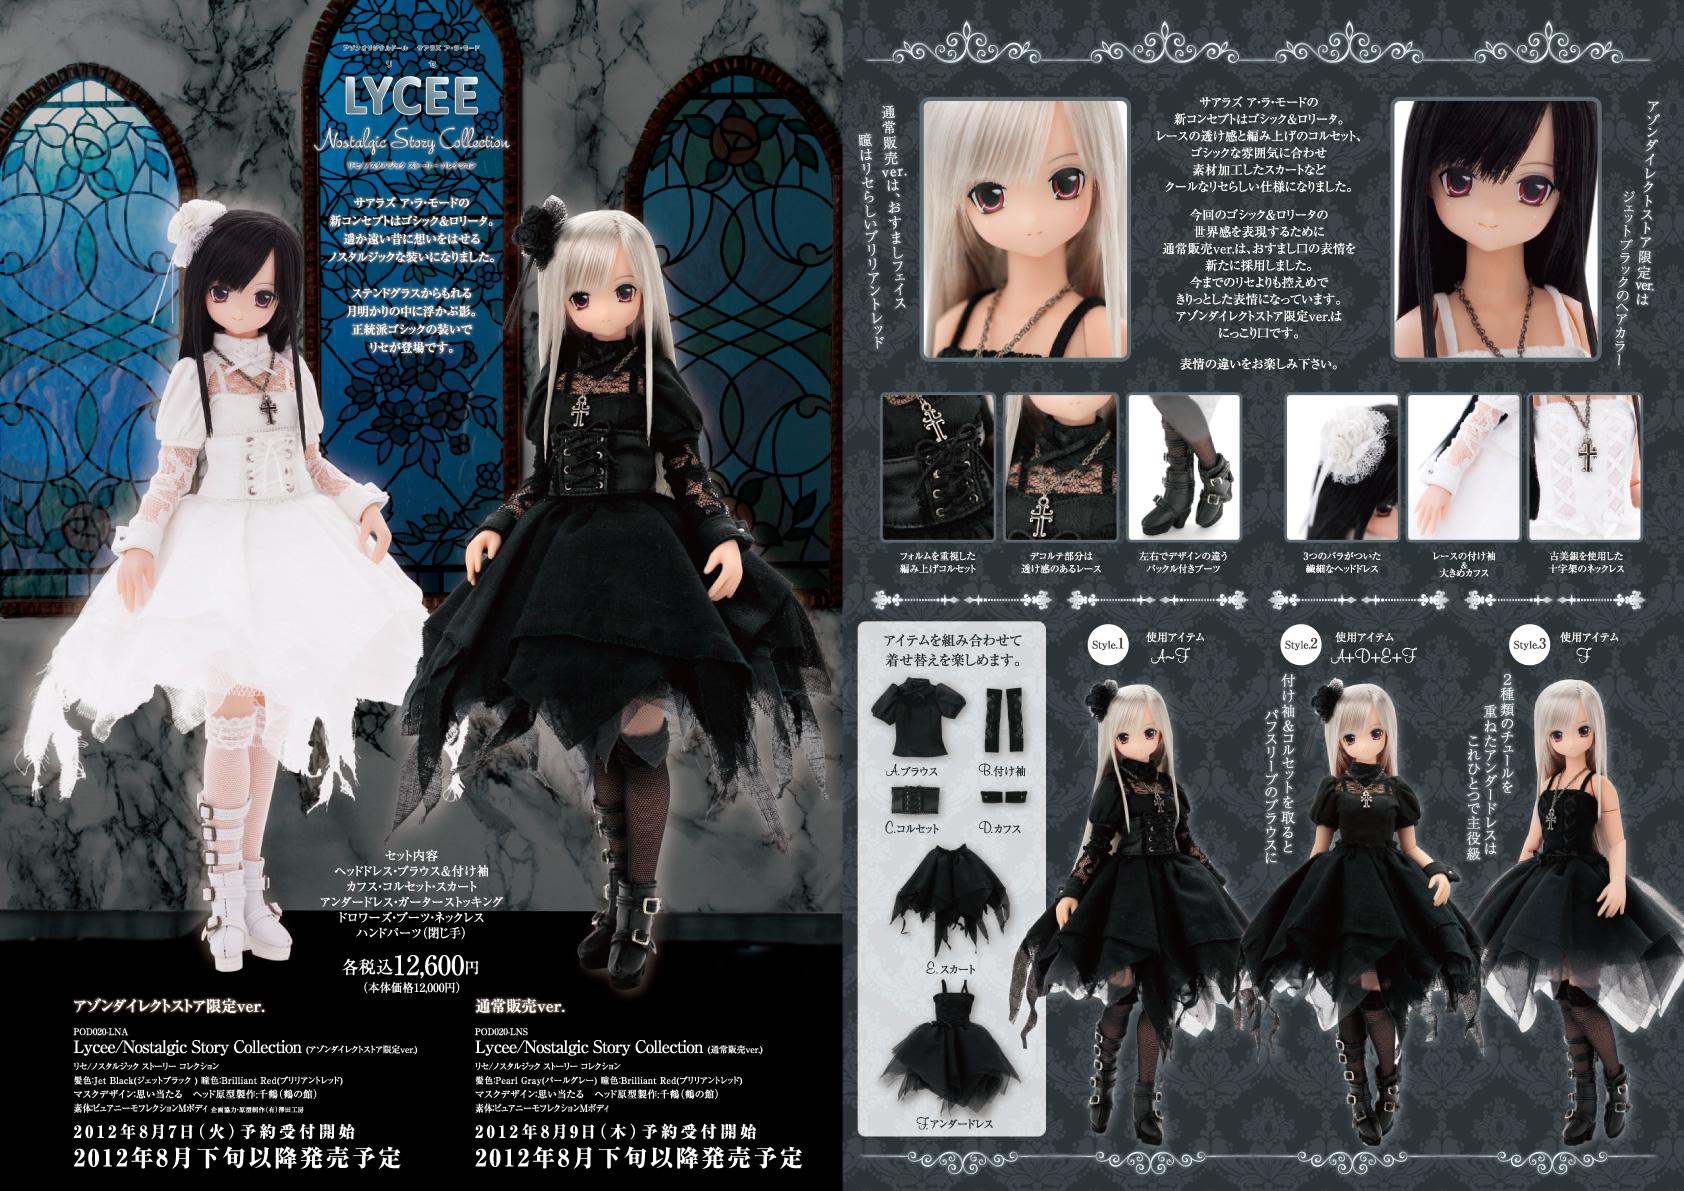 Lycee/Nostalgic Story Collection